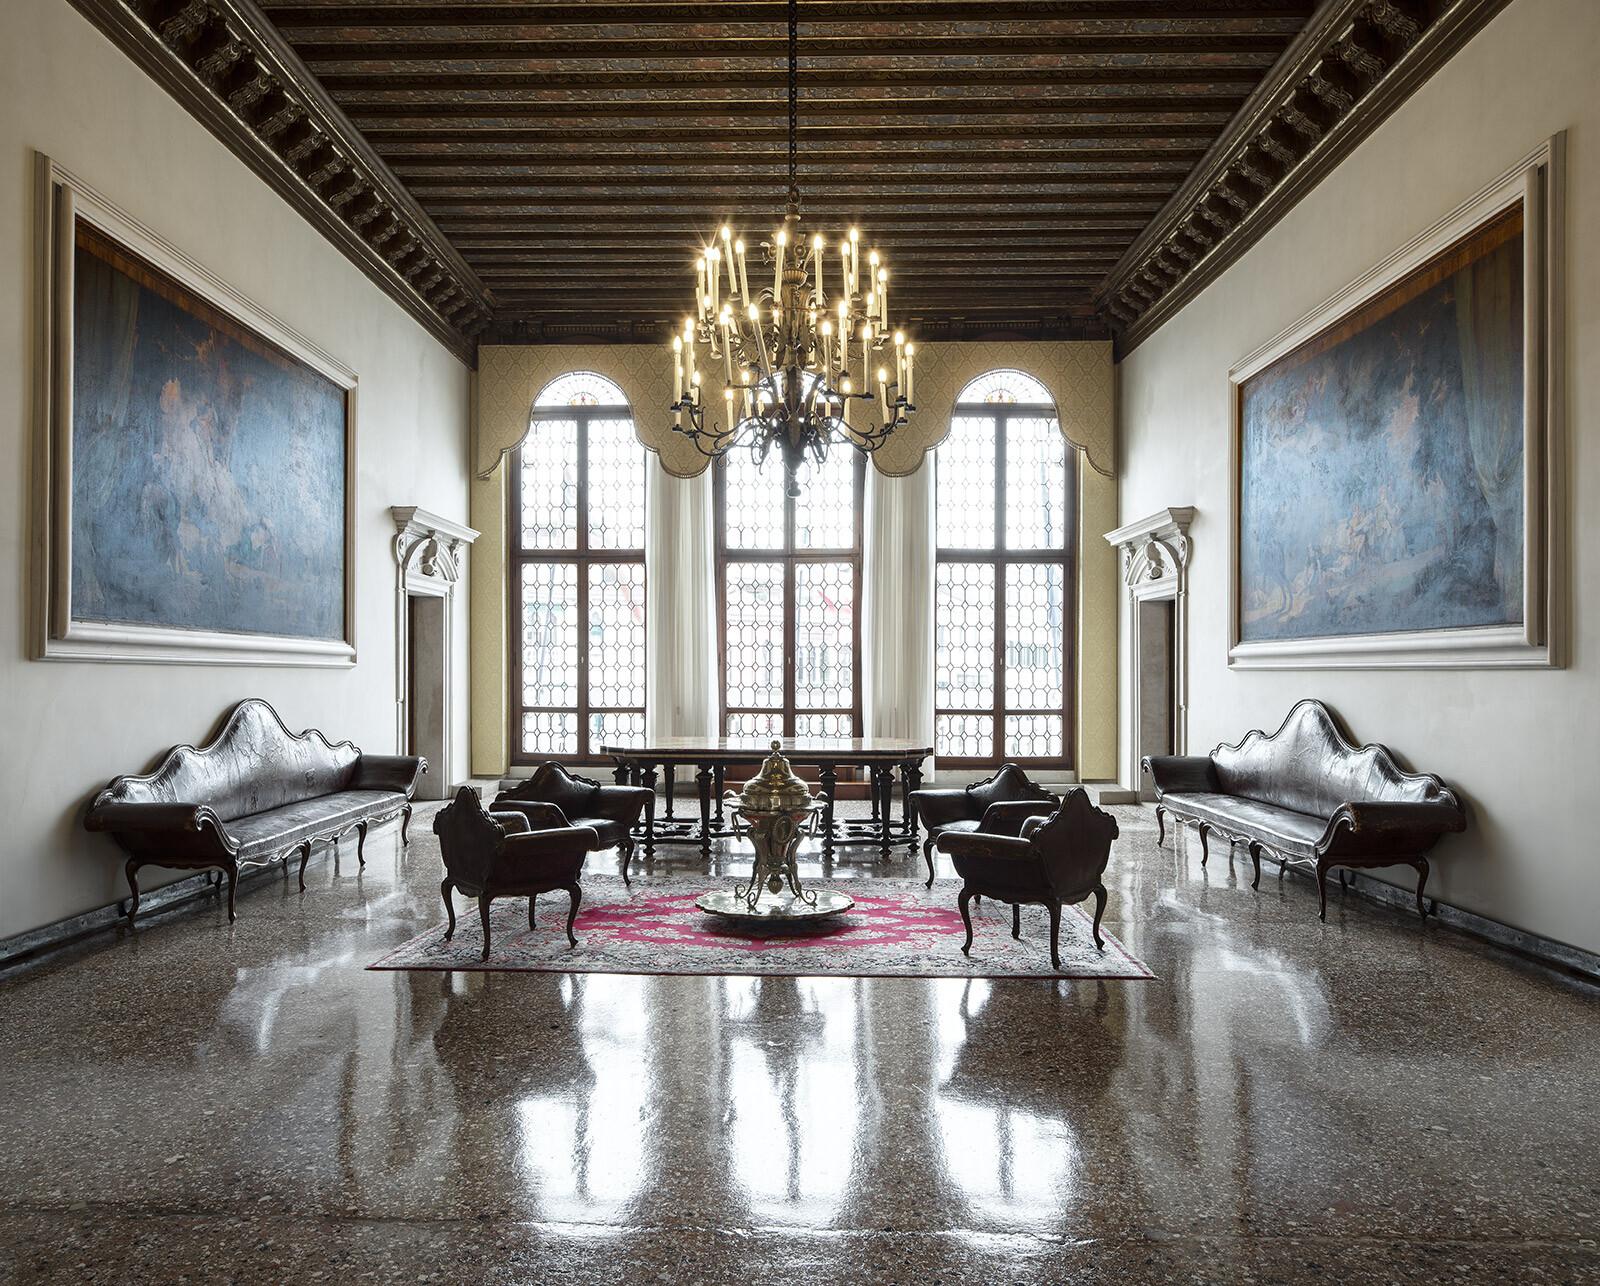 Palazzo Balbi, Sala - Reinhard Görner